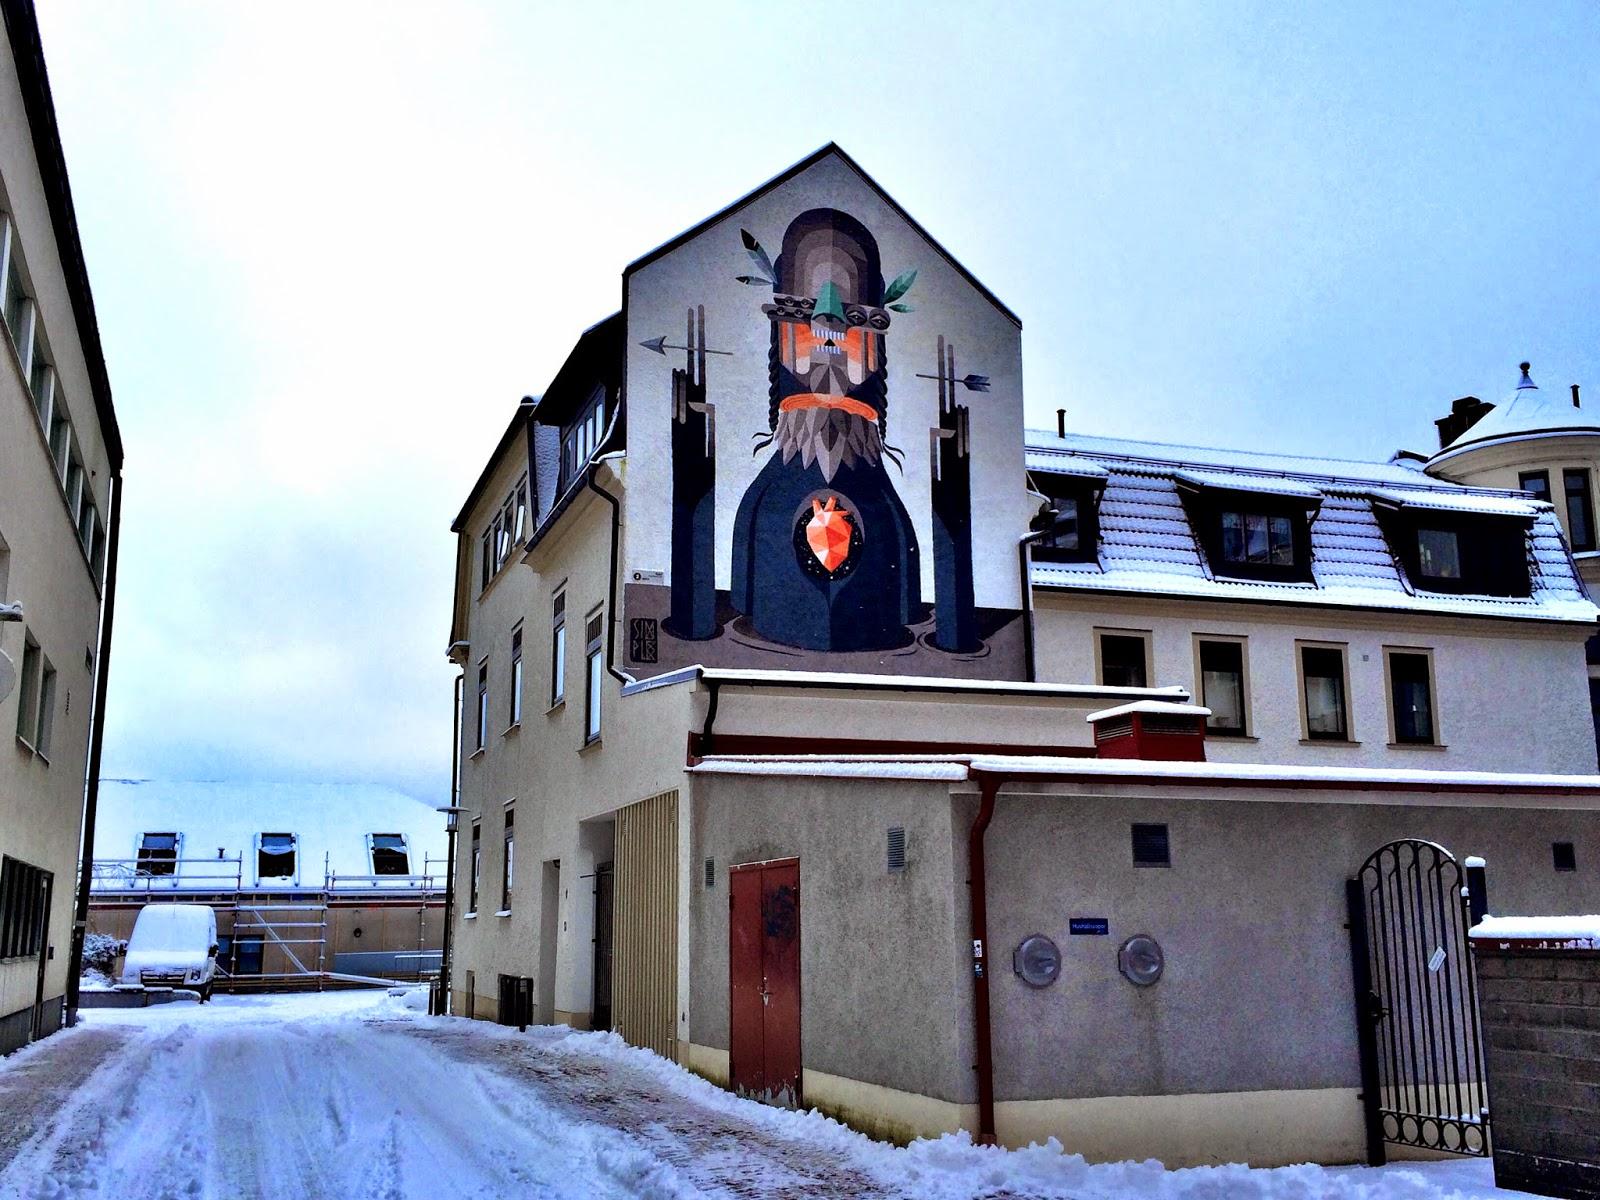 hitta ledsagare liten i Borås